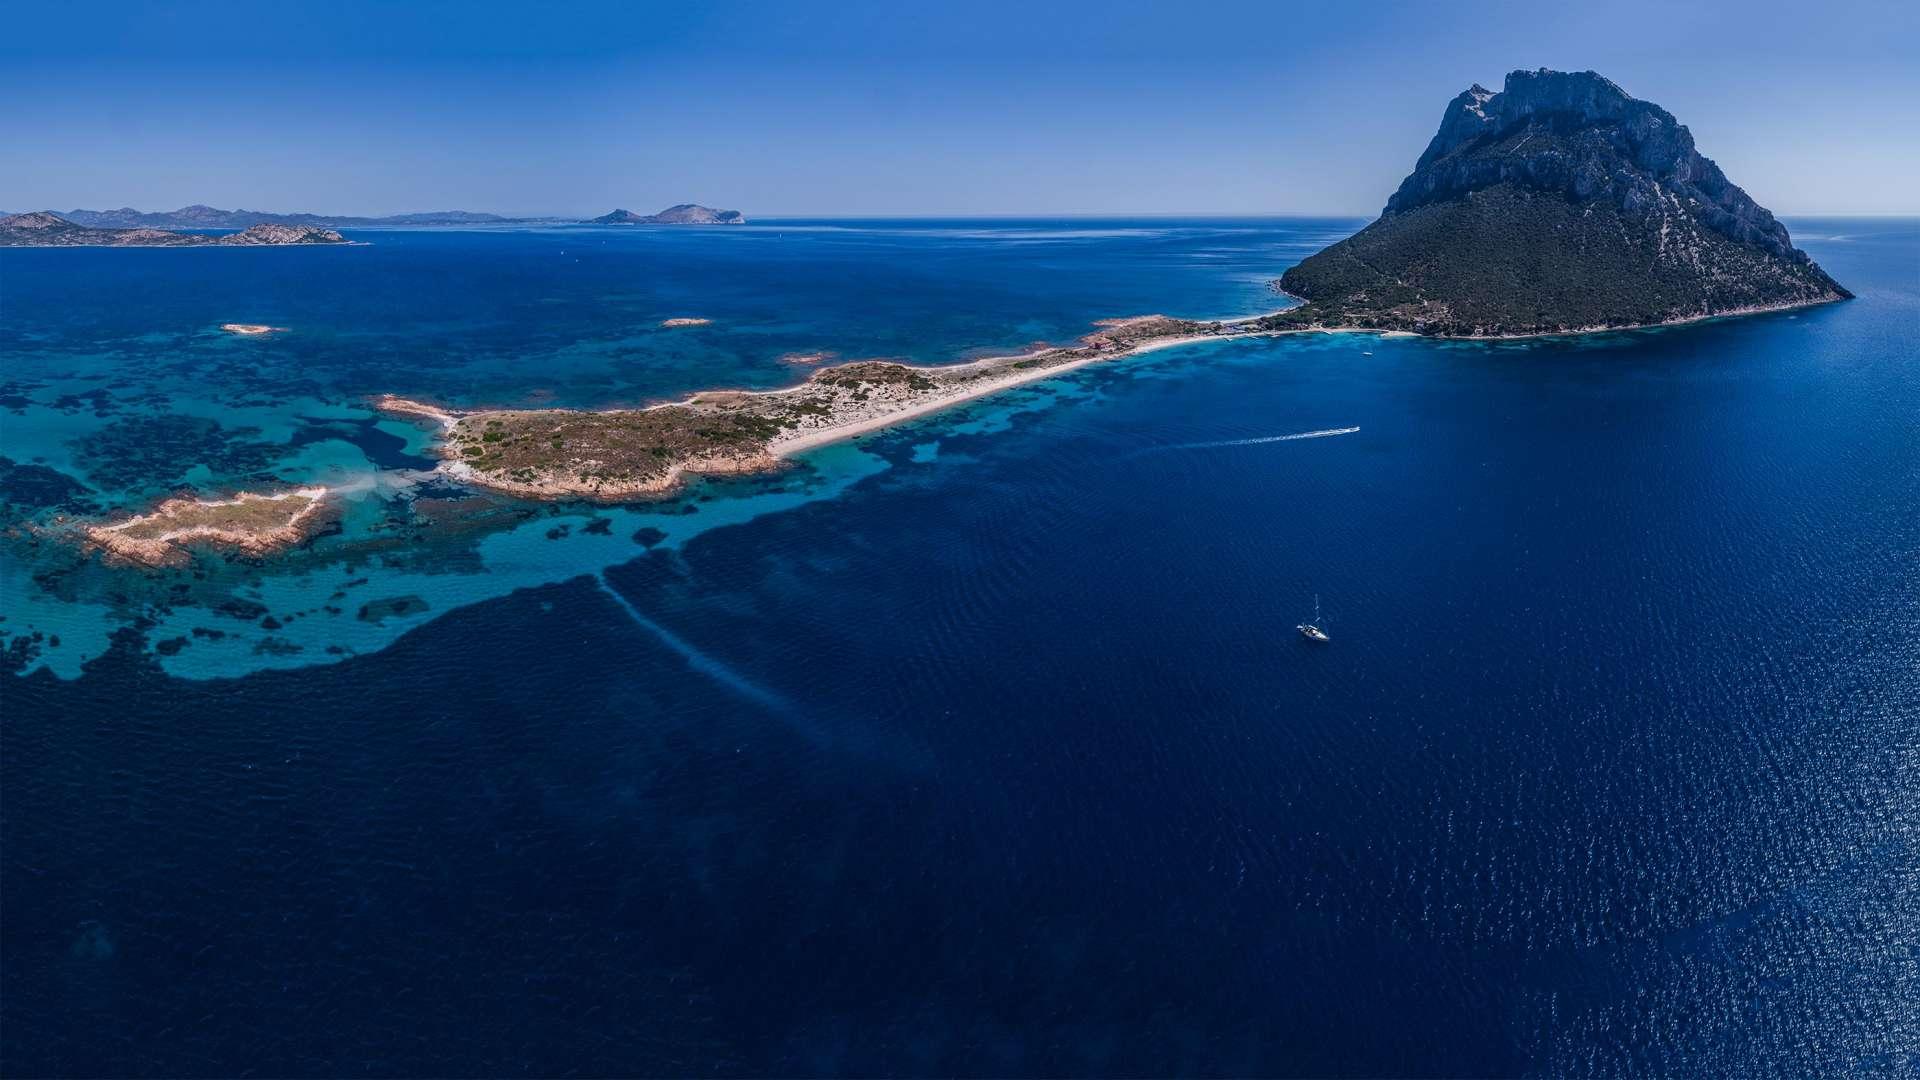 Isola Tavolara Sardinia Sardinia Aerial Photography drone Enrico Pescantini